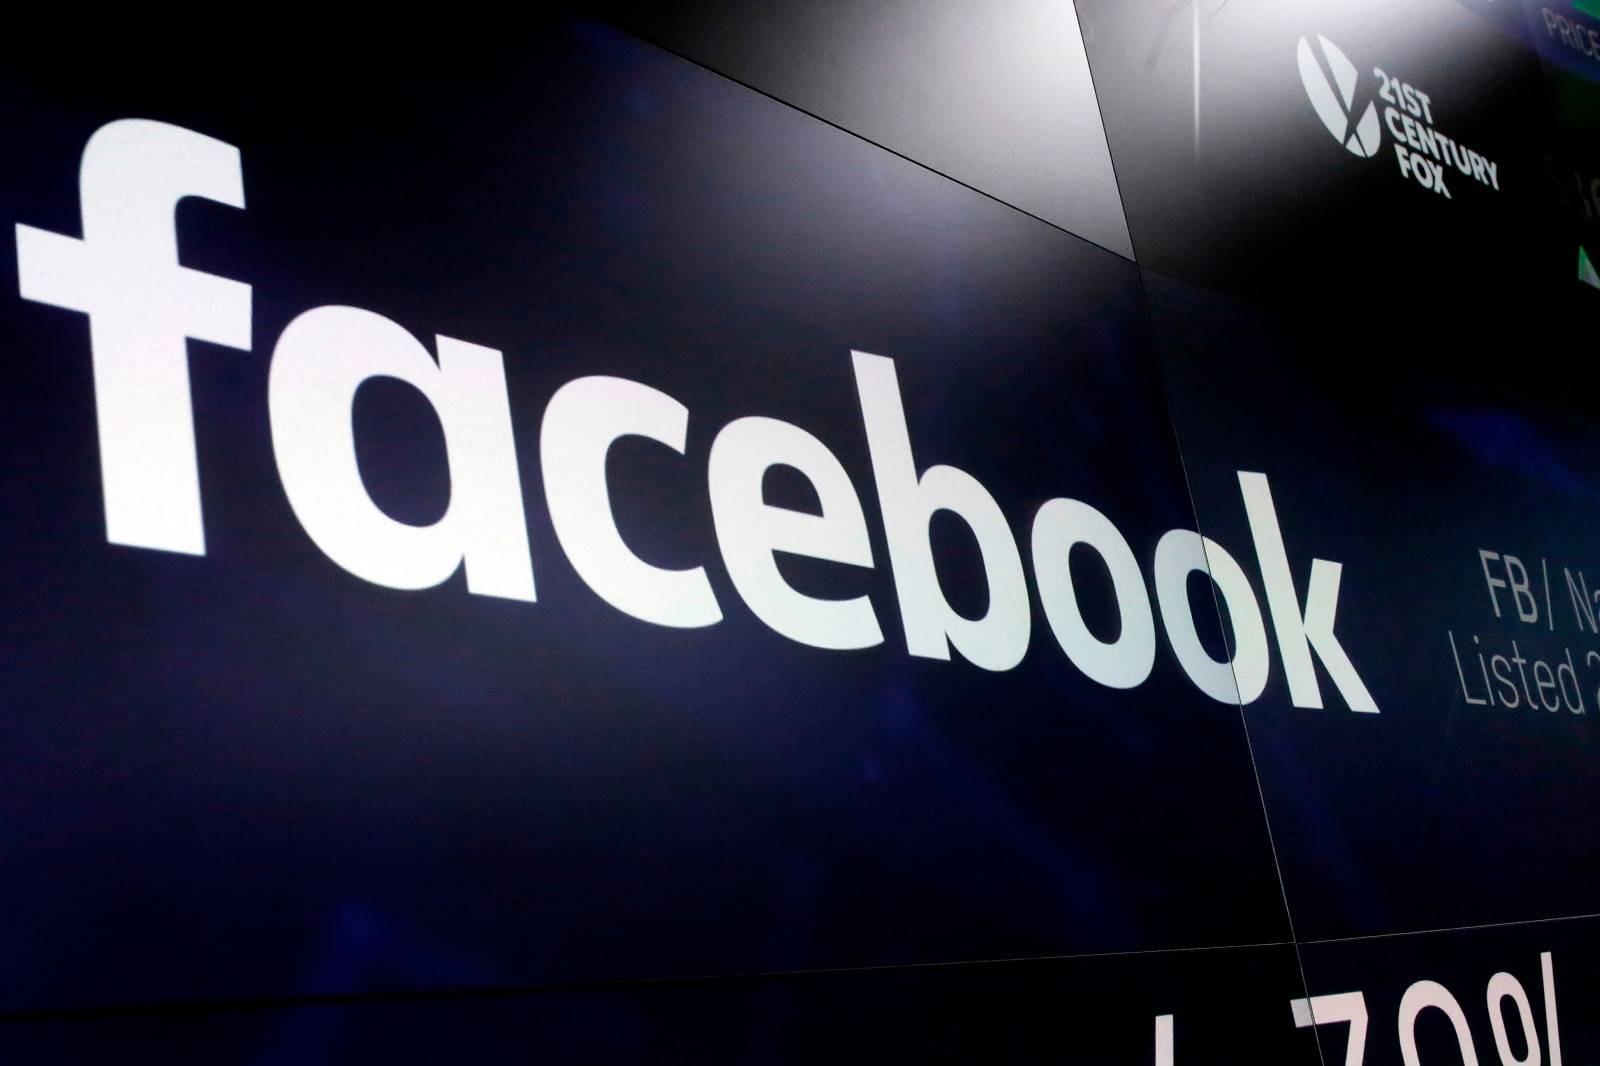 Facebook: Δοκιμάζει την εμφάνιση πληροφοριών από τη Wikipedia μέσα στο κοινωνικό δίκτυο